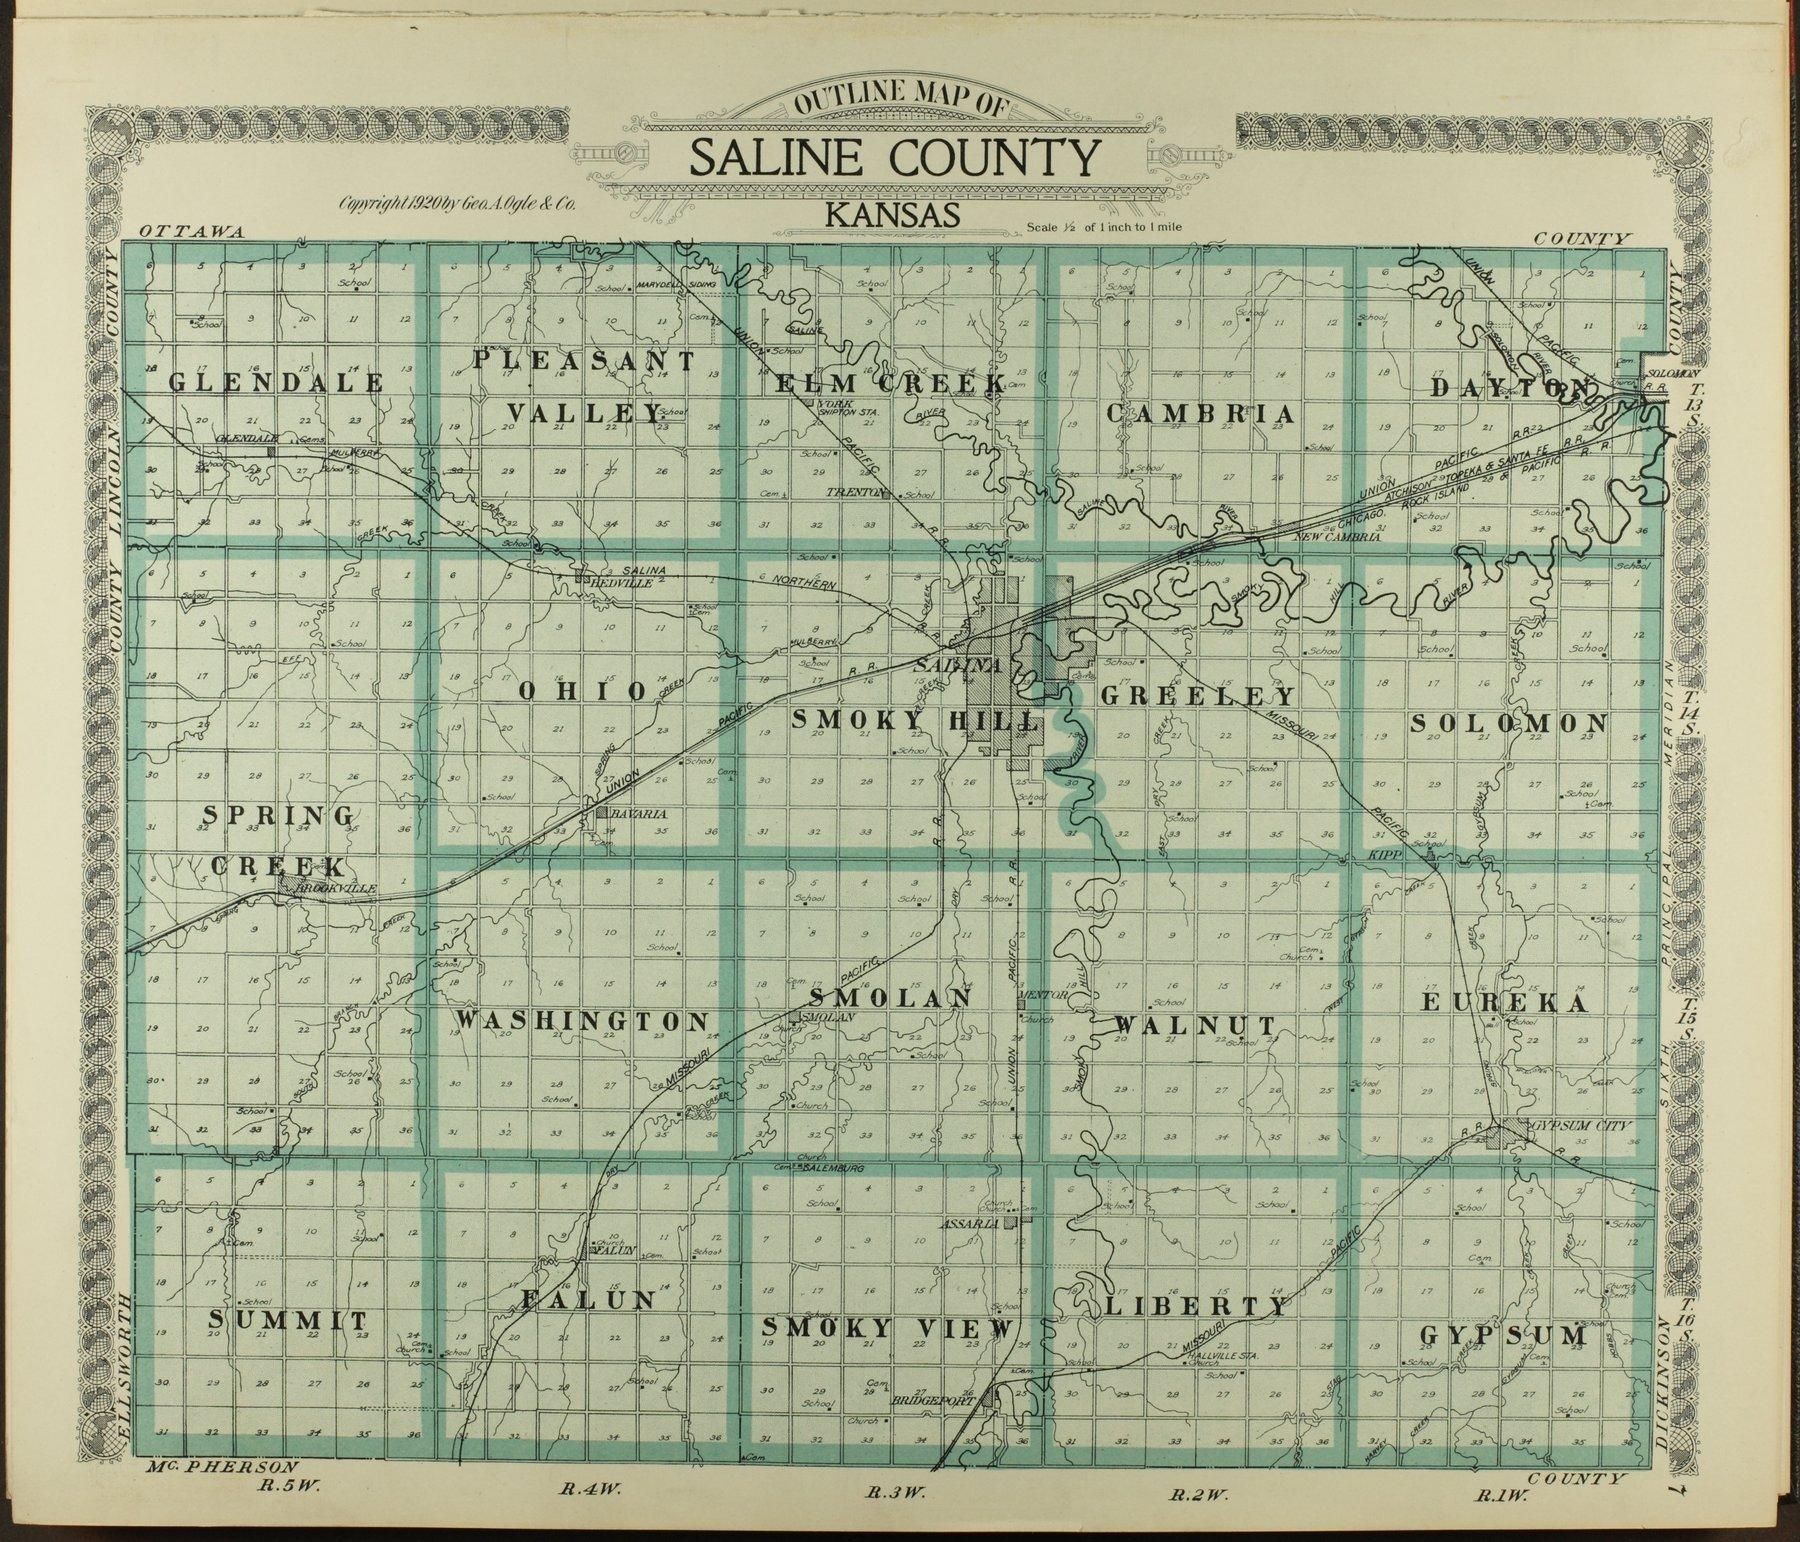 Standard atlas of Saline County, Kansas - 7